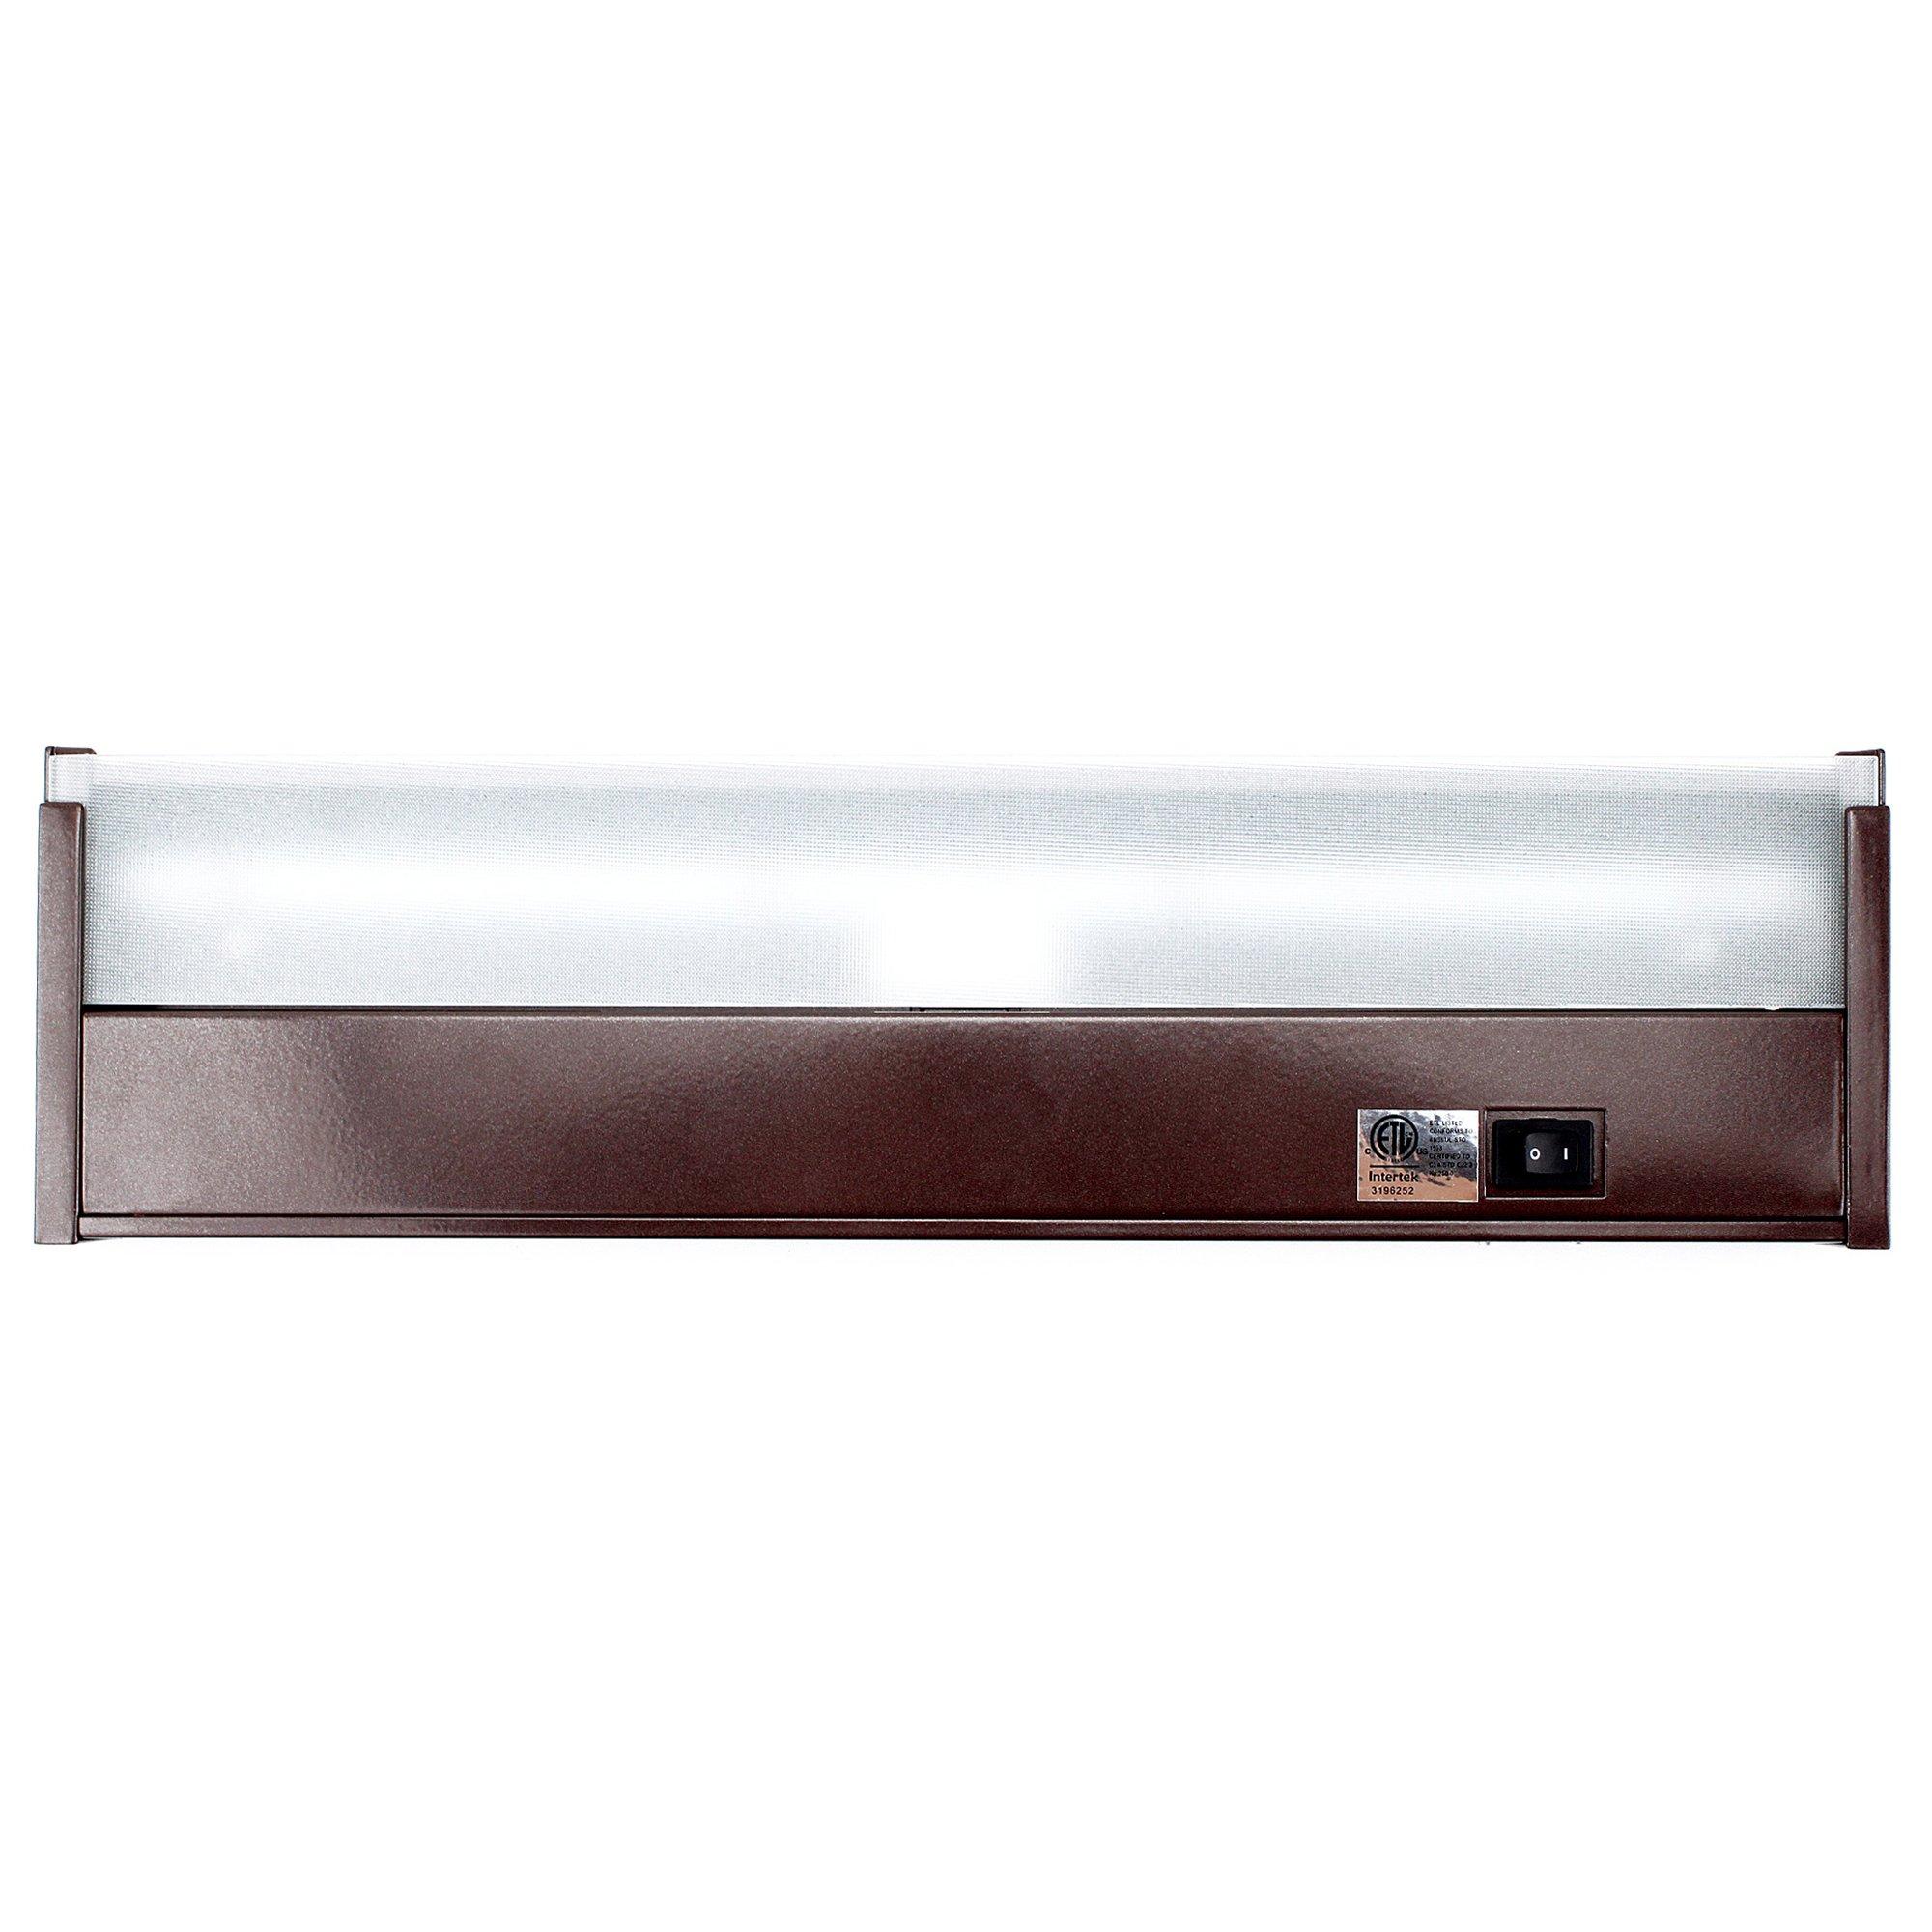 GM Lighting UCLED-16-BZ-DIM 120V LED Undercabinet Lighting, LumenTask LED Lighting, Quality LED's, 3000K, 16'', Bronze